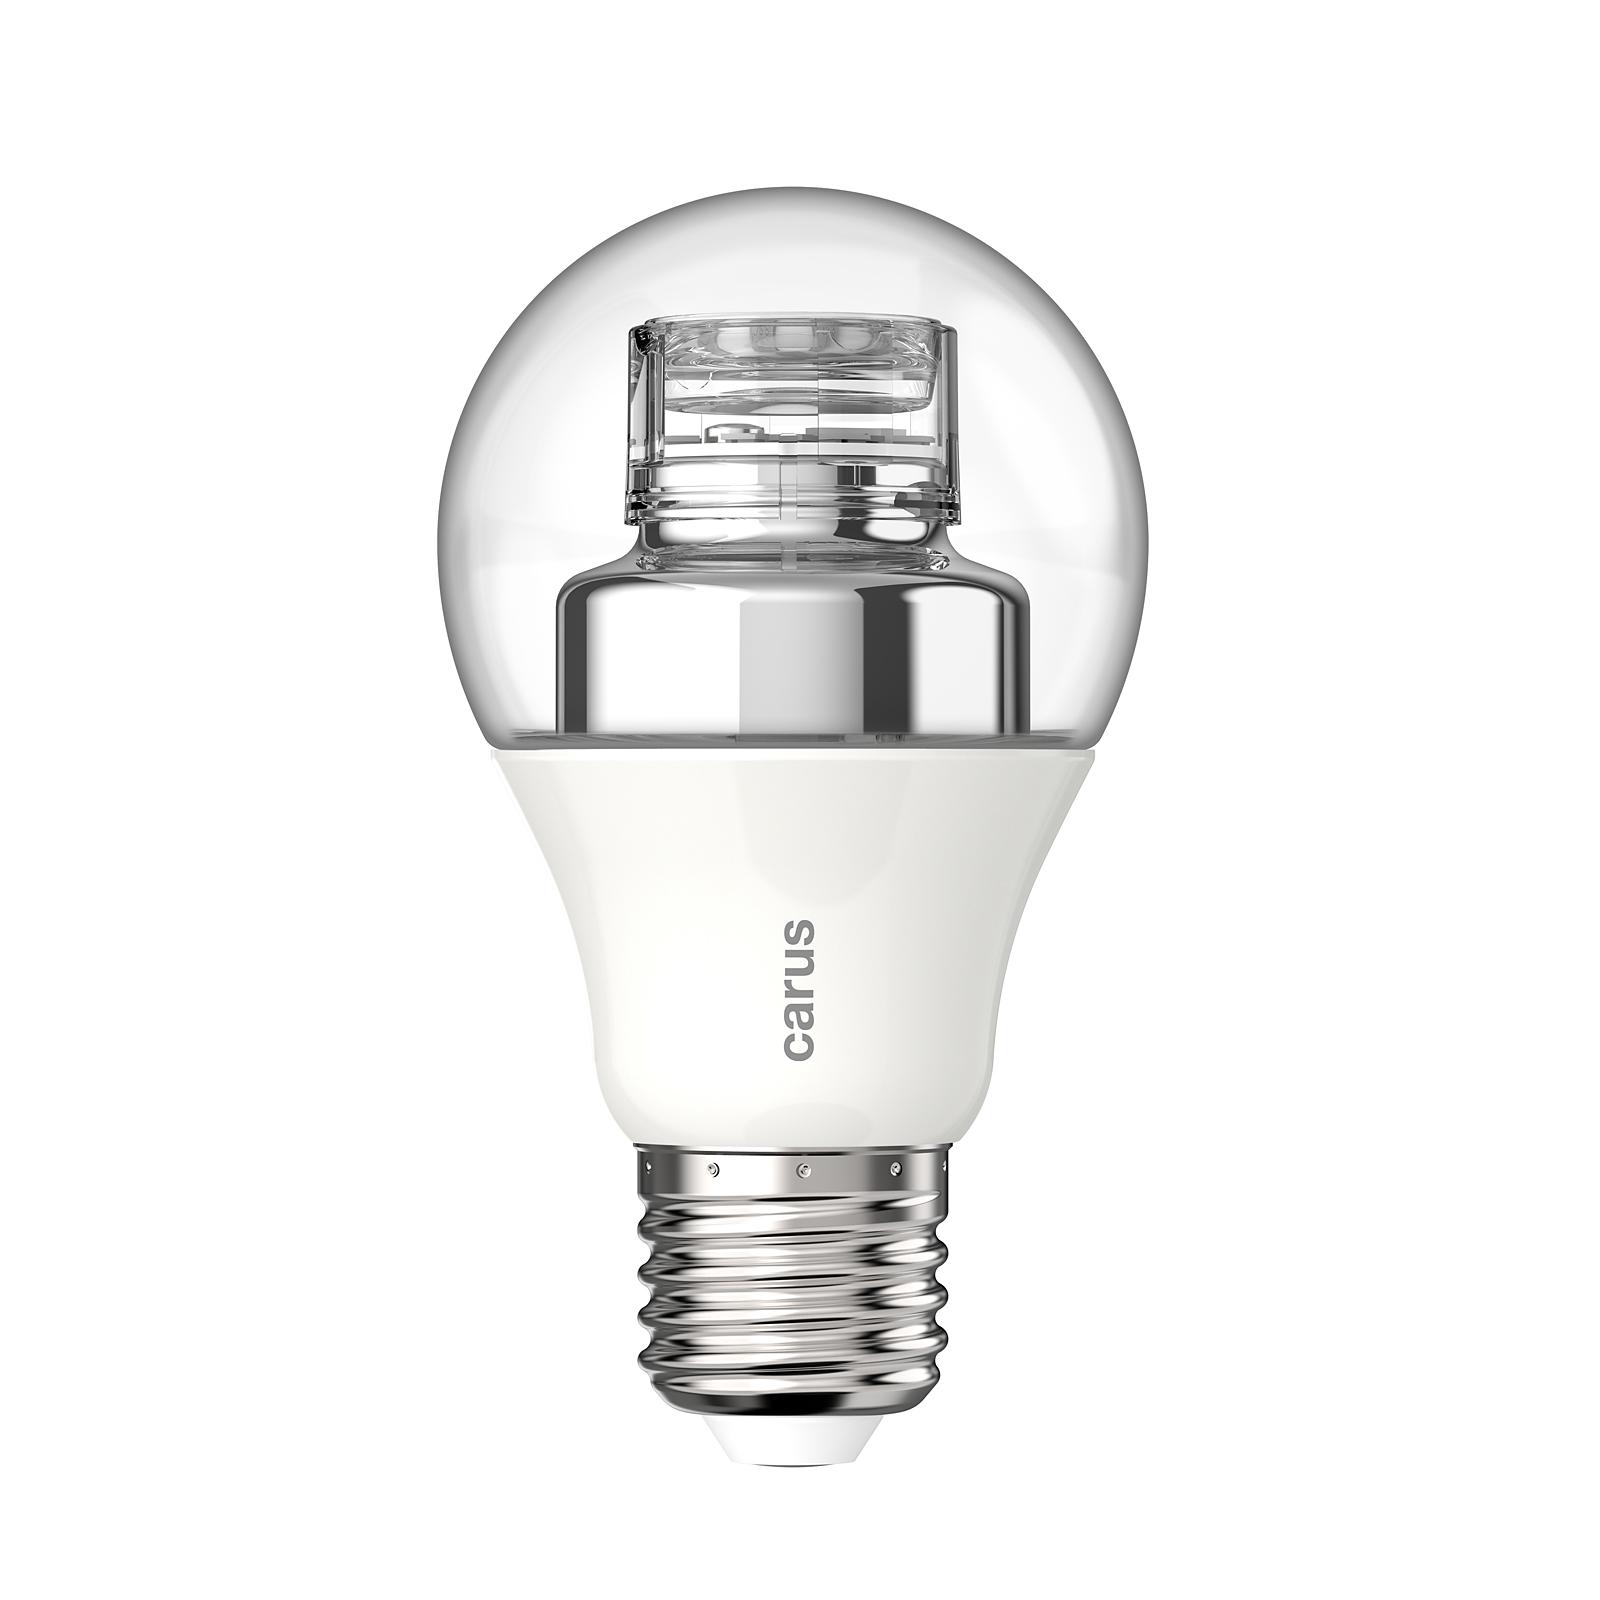 10880-LED-Lampe-CARUS-Dim-By-Click-8W-E27-Warmweiss-Dimmbar-per-Lichtschalter-1